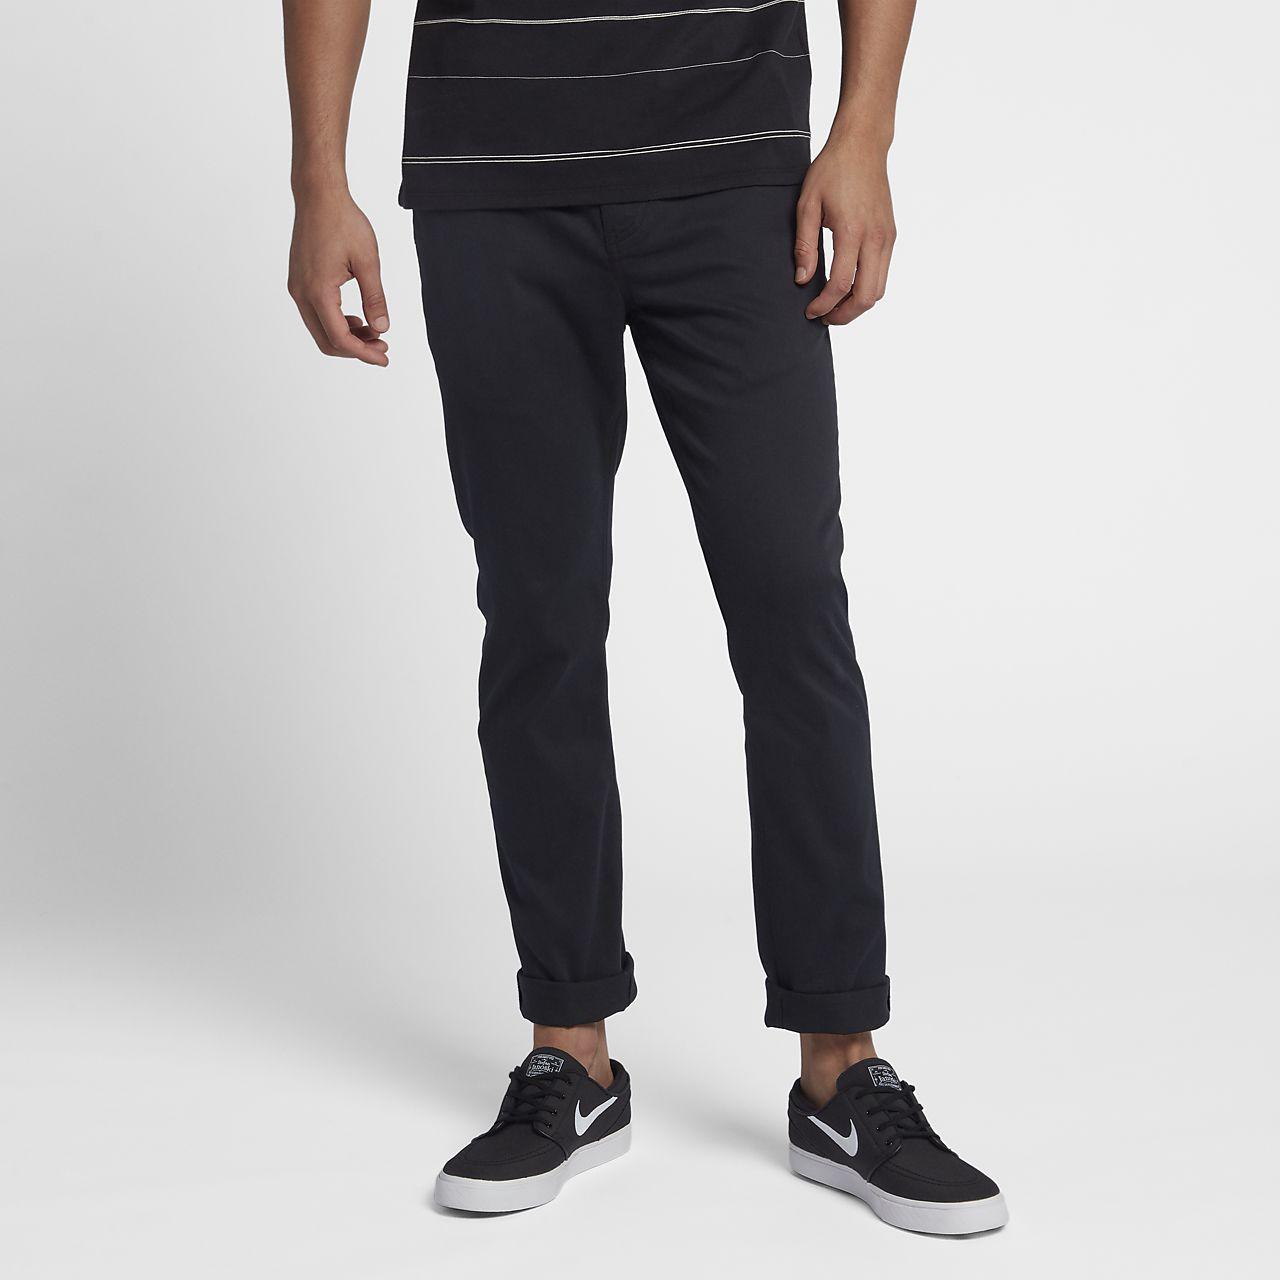 quality design a0fce c44a4 ... Hurley Dri-FIT Worker Men s Pants